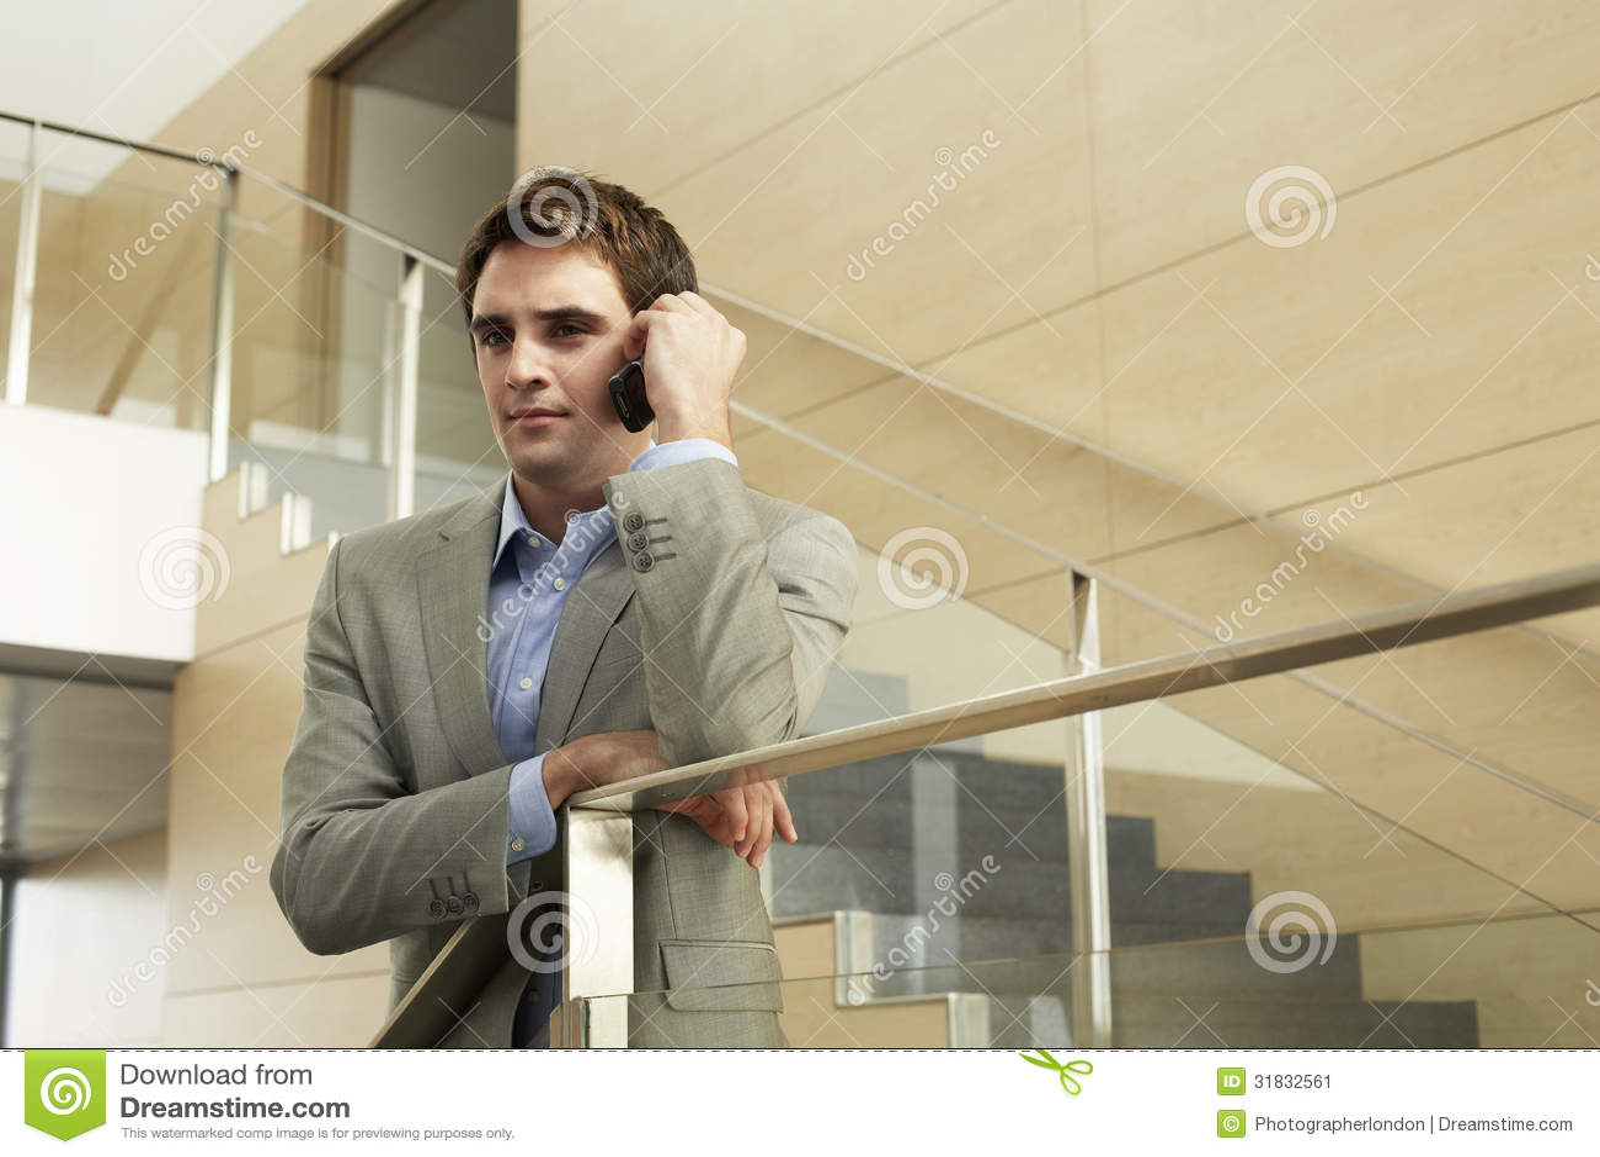 Hombre de negocios Using Cellphone While que se inclina en la verja de cristal